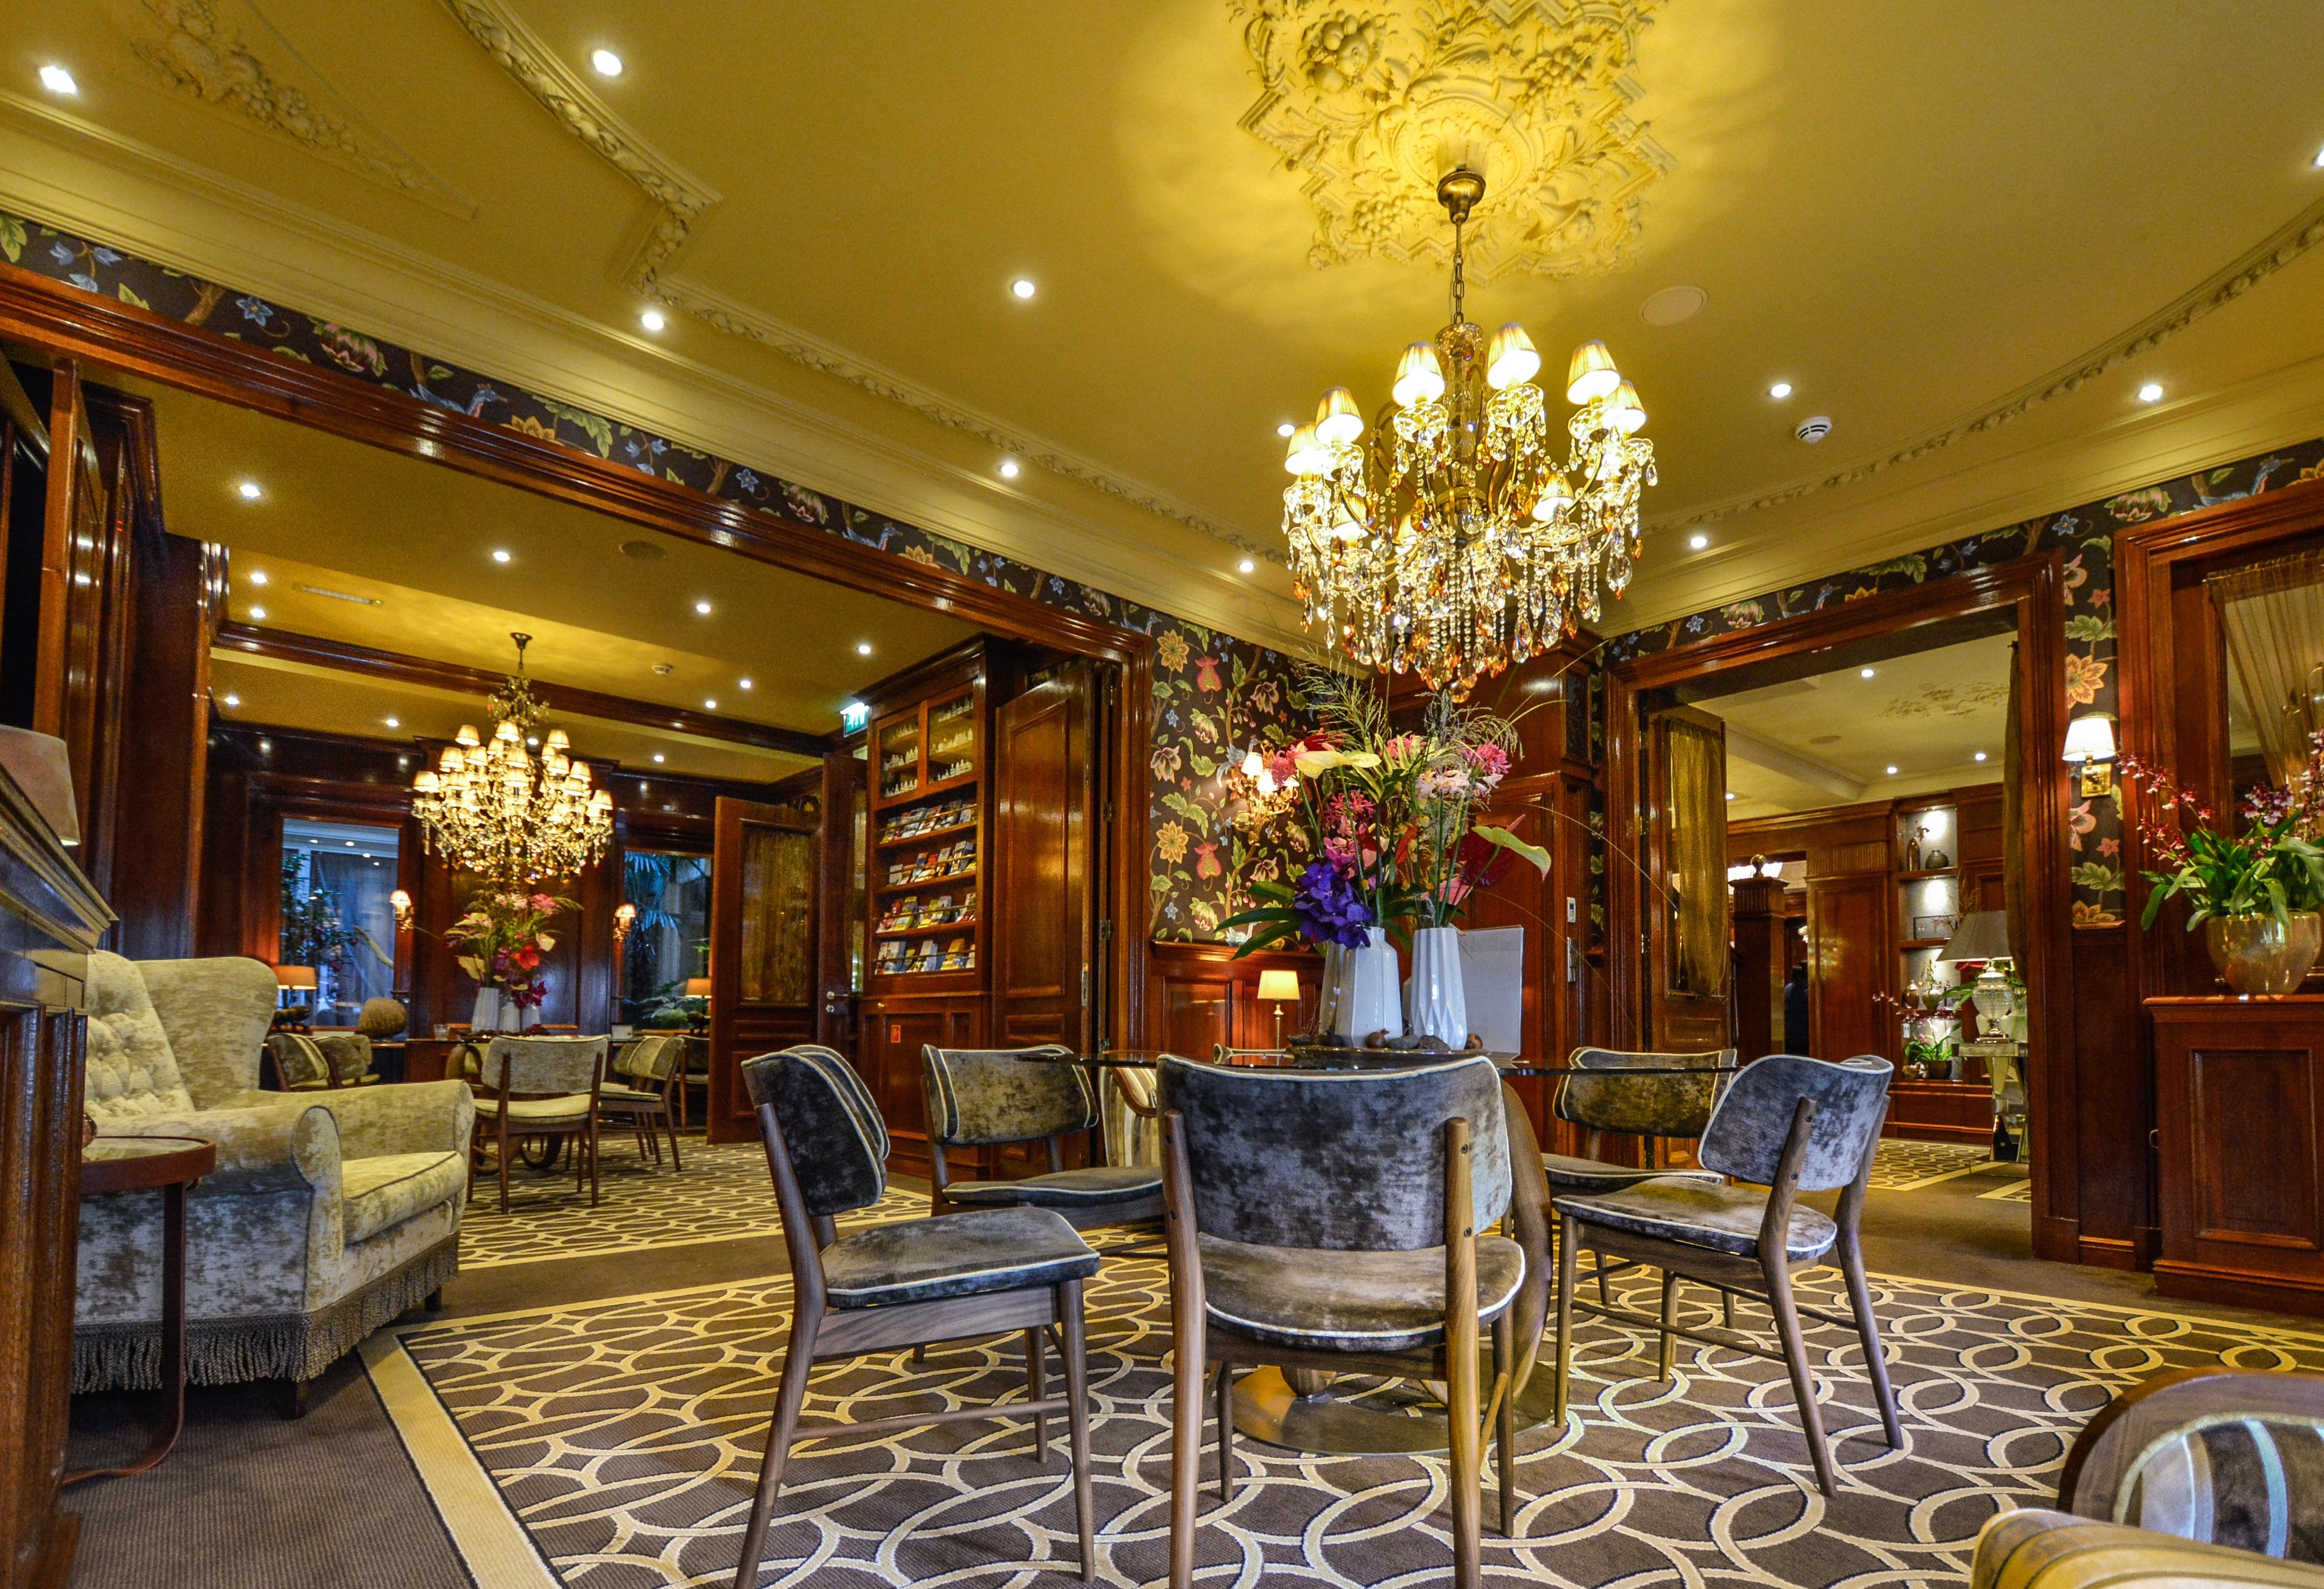 Hotel Istana Gambar Rumah Besar Restoran Istana Perjalanan Eropah Makan